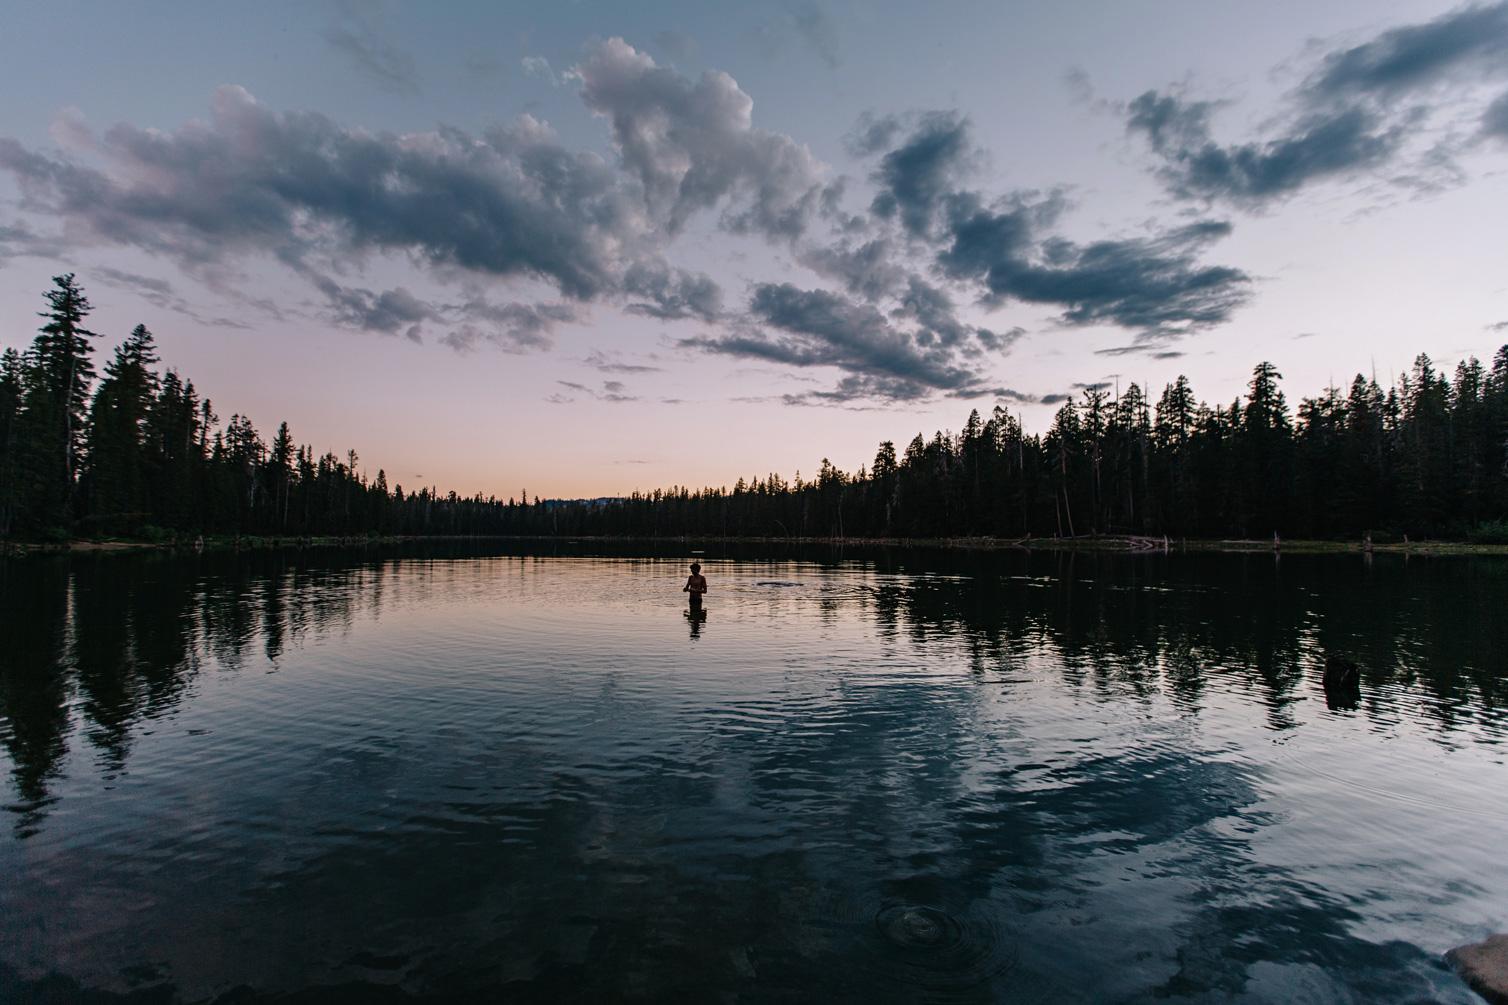 CindyGiovagnoli_outdoors_photographer_Sierra_Buttes_firetower_watchtower_Sardine_Snag_Bear_lake_hike_swim_camp-043.jpg